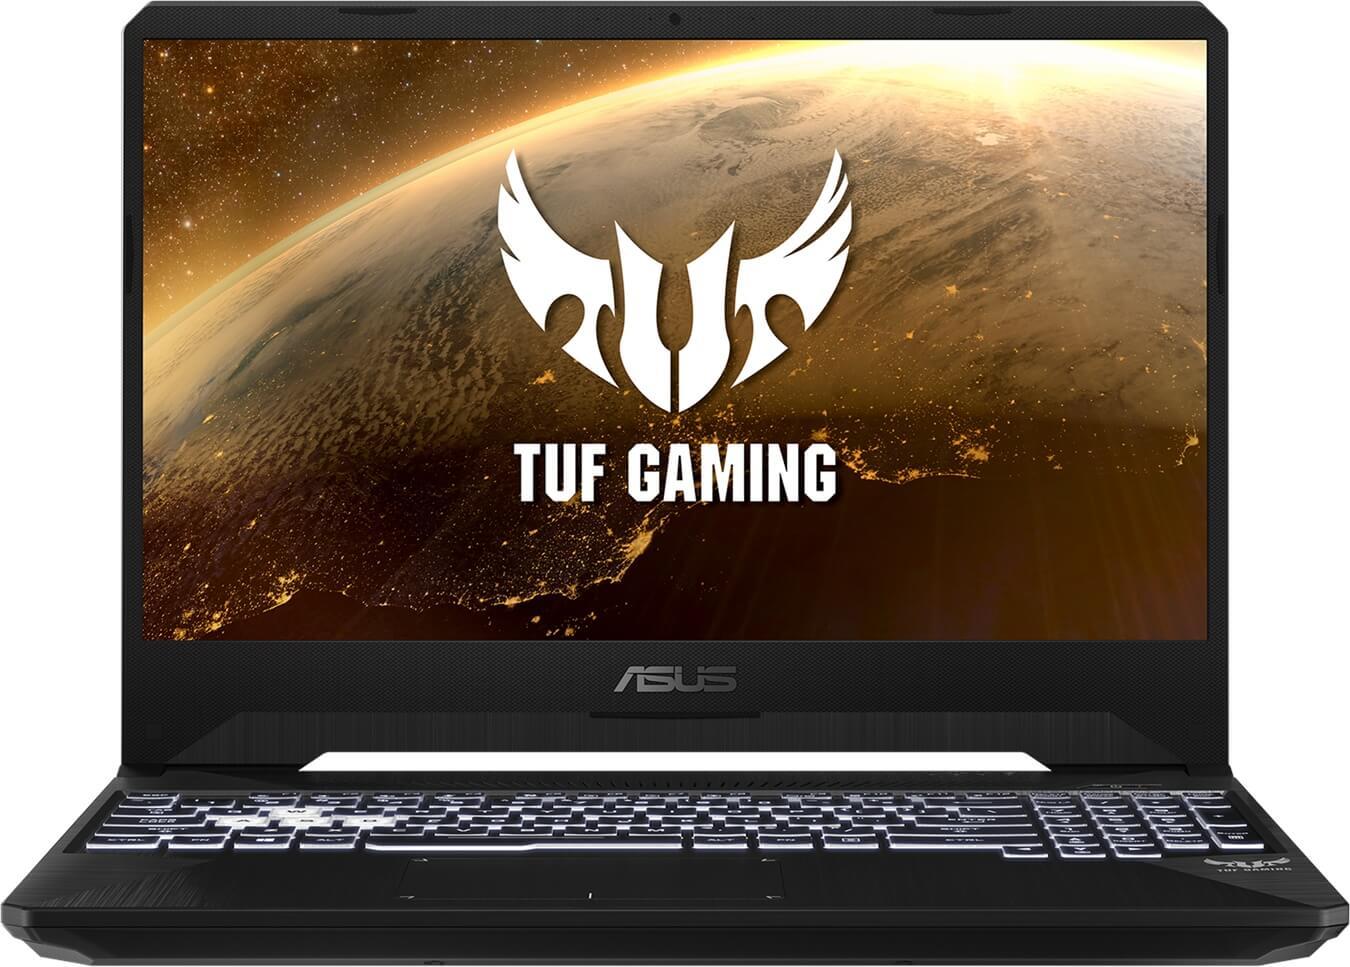 TUF (Gaming - FX505GT) photo 5